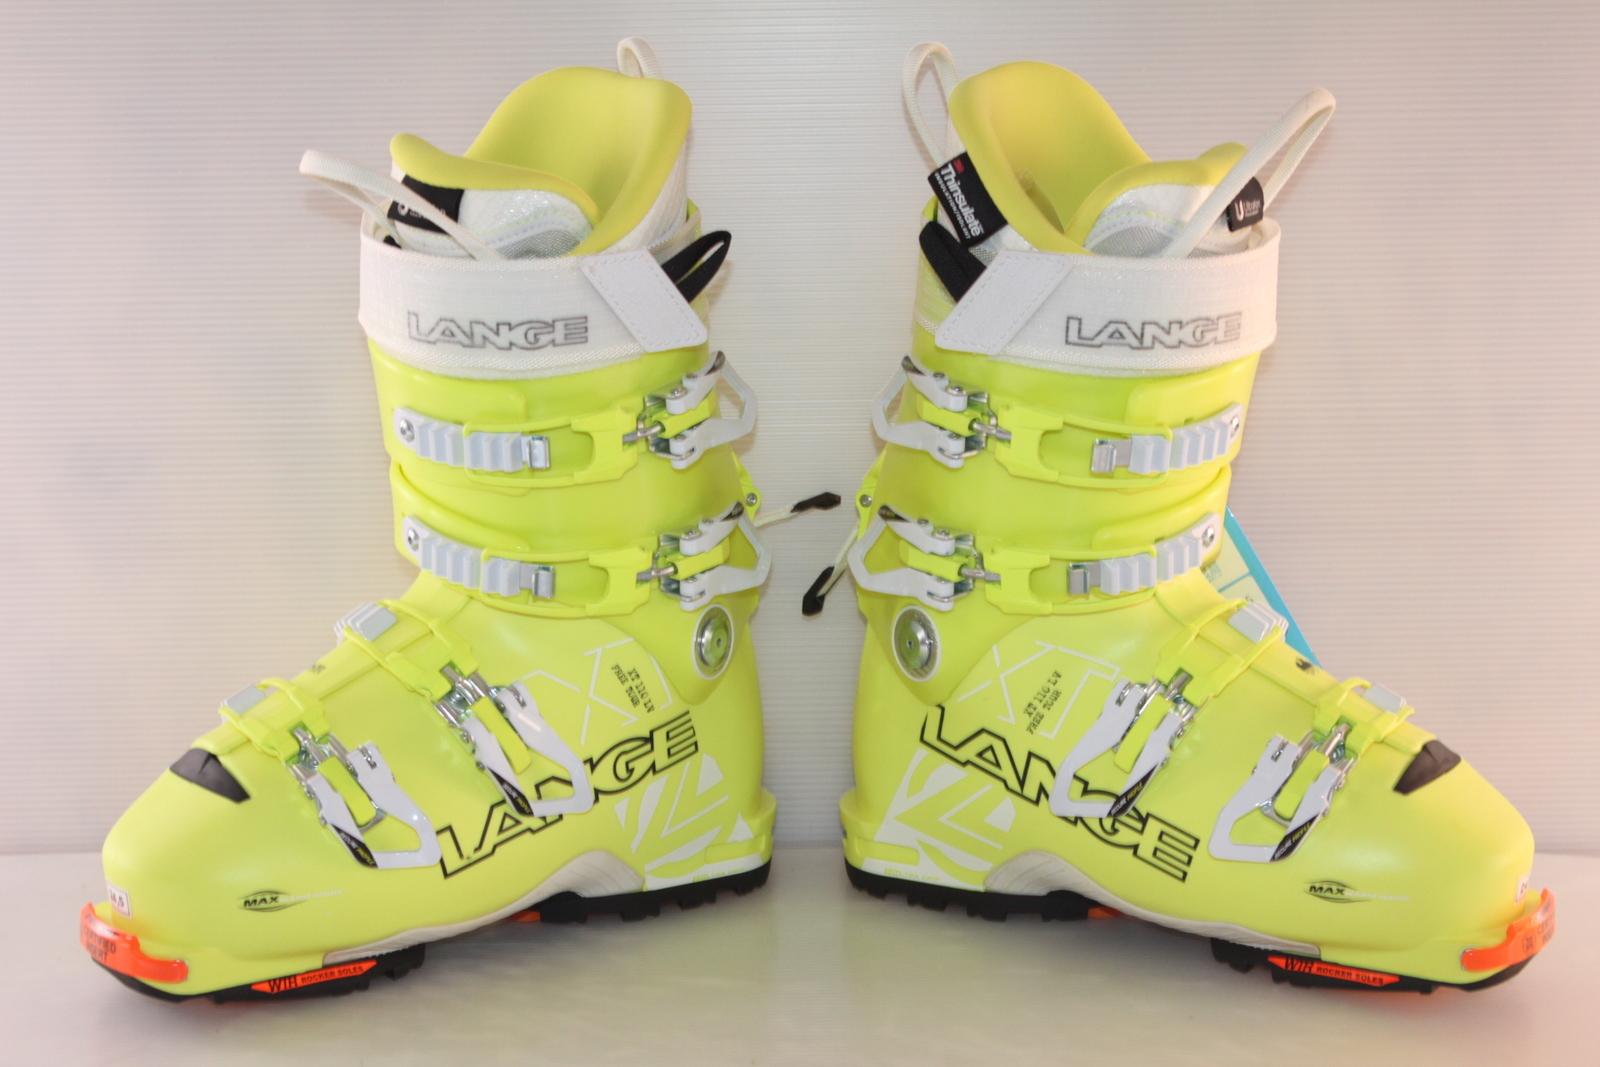 Skialpové boty Lange XT - skialp vel. EU38.5 flexe 110